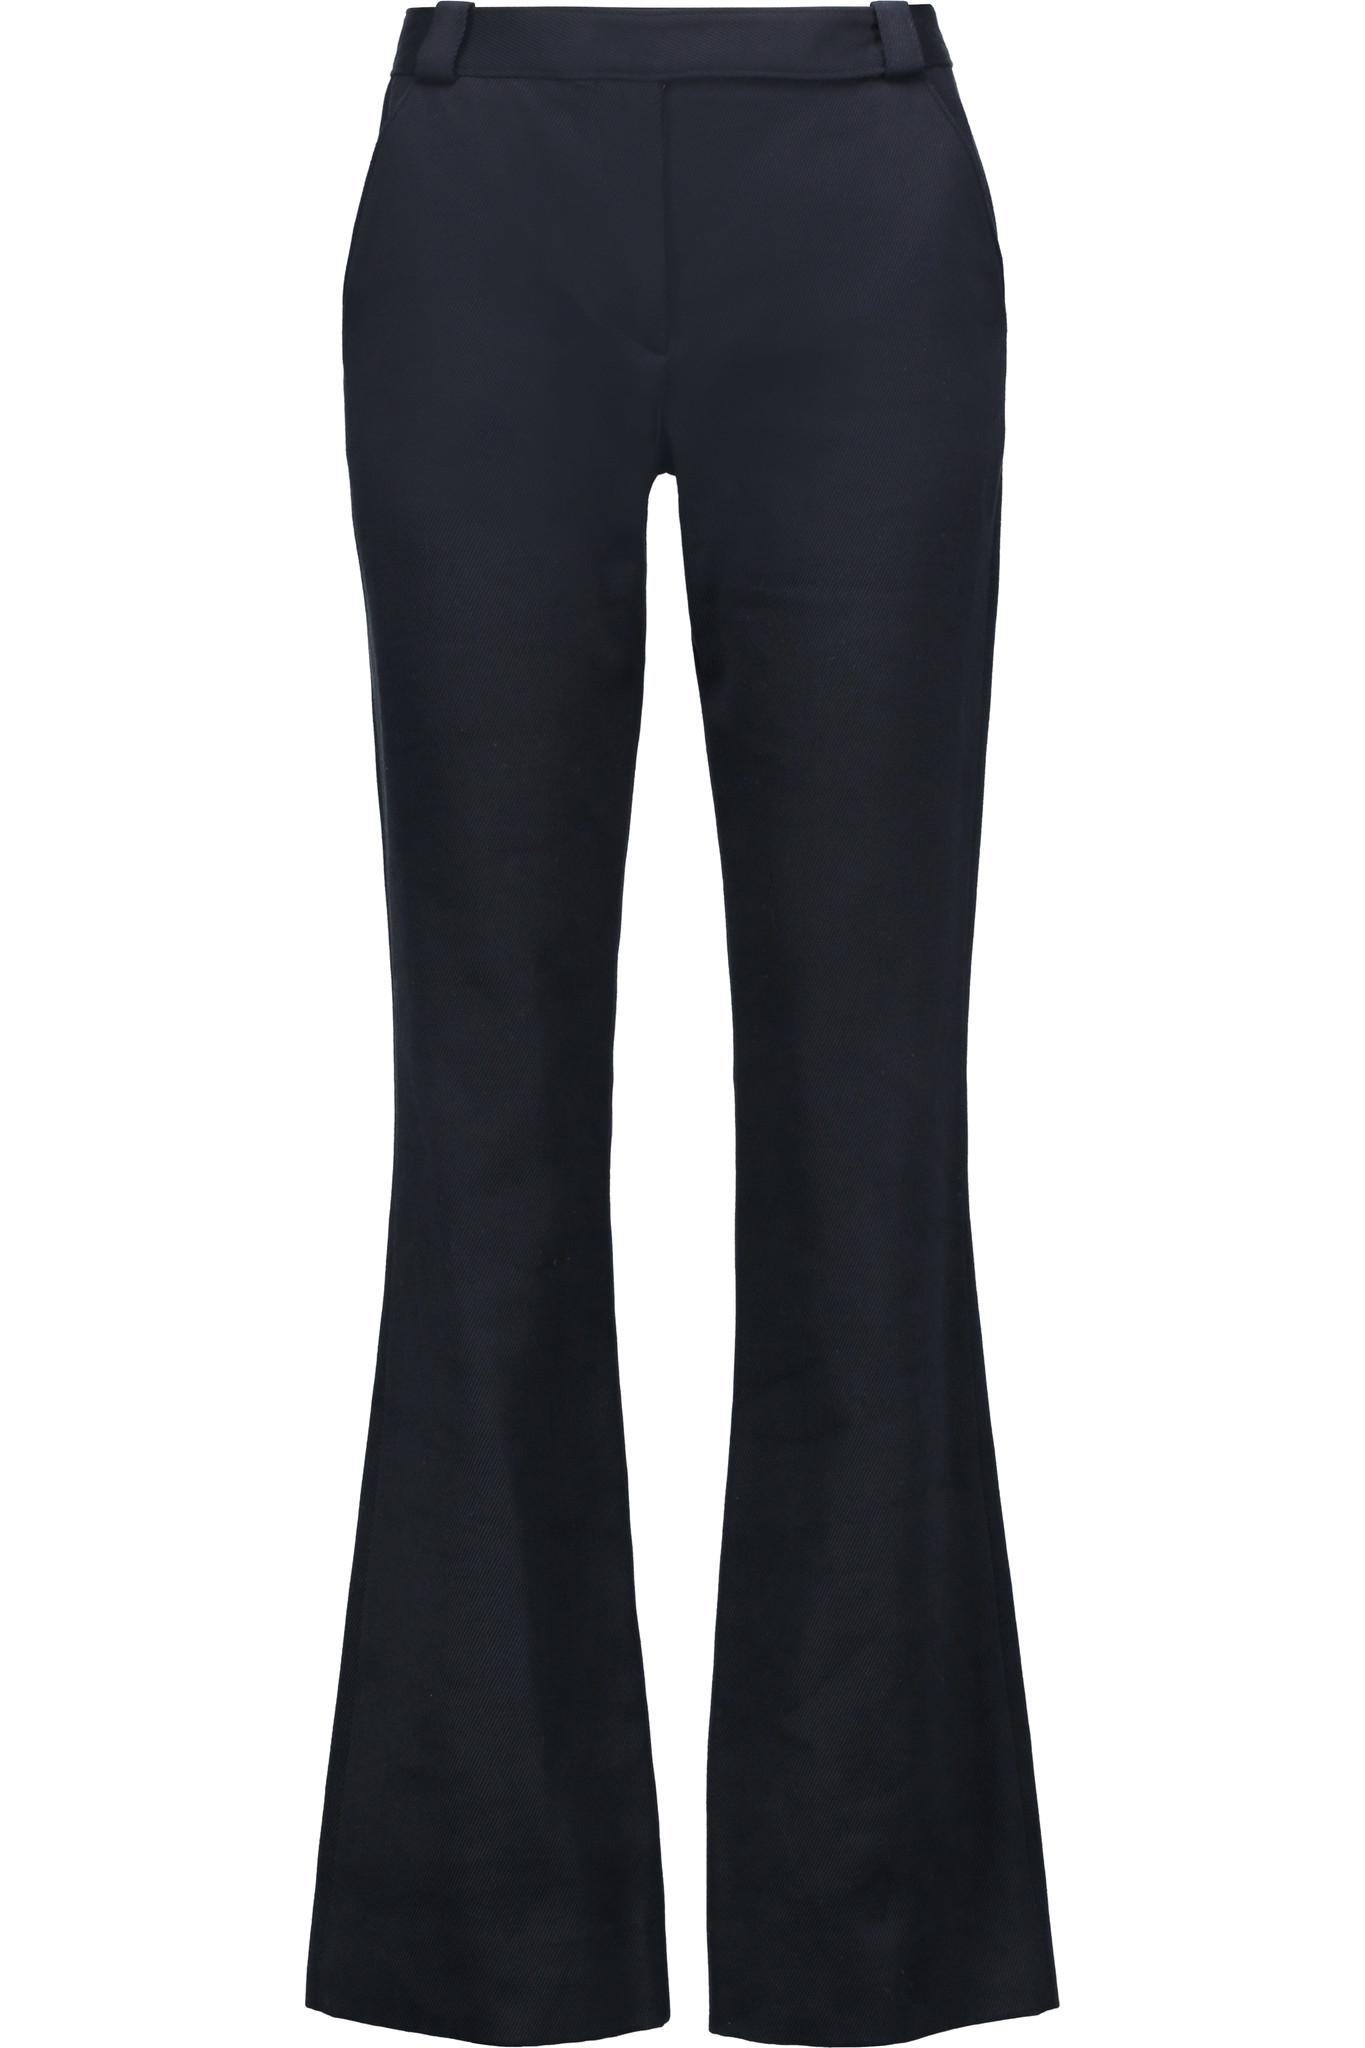 Amazing Women39s Slim Fit Boot Cut Stretch Twill Pant  BLACK BK